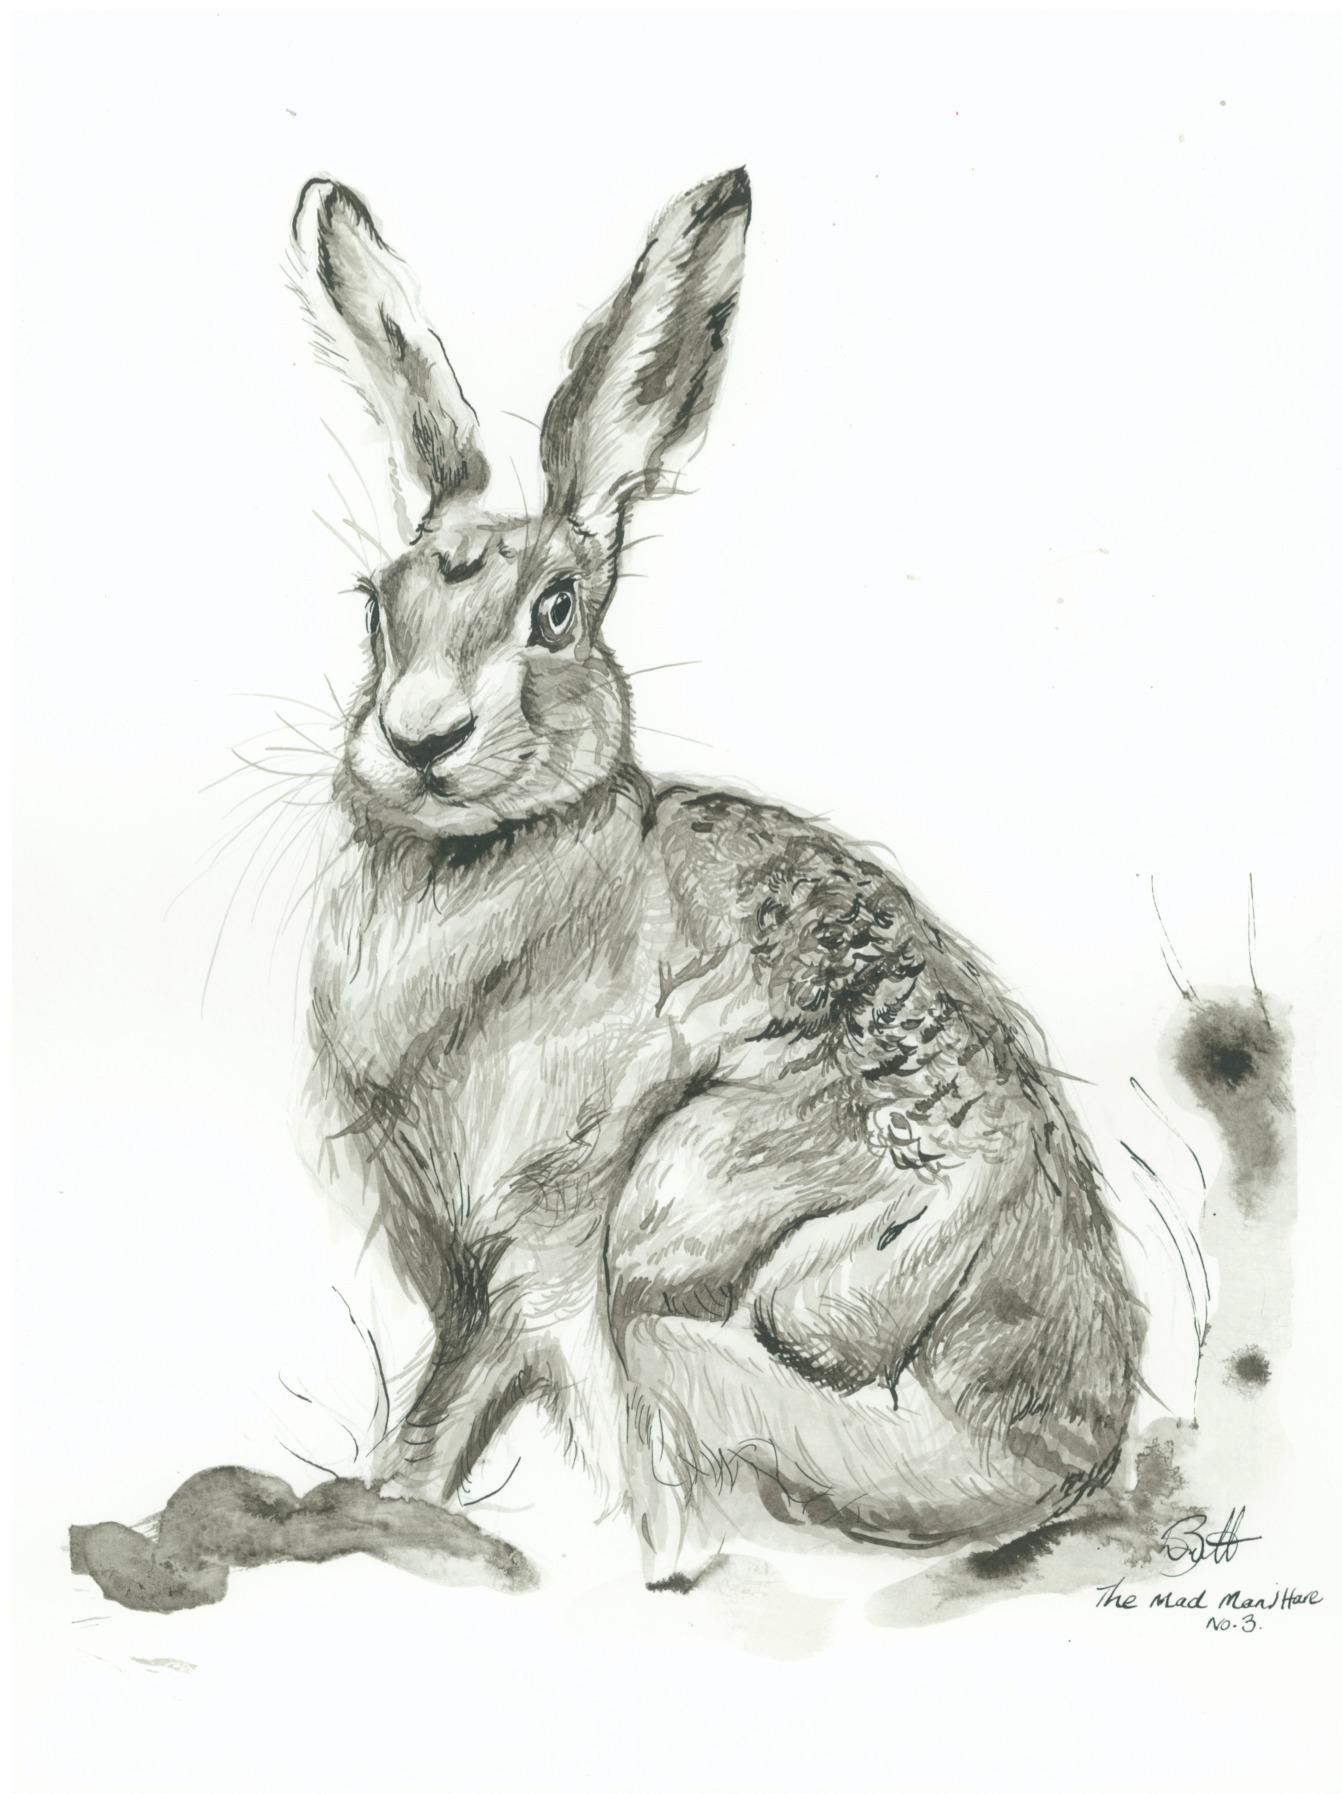 The Mad Manj Hare no.3